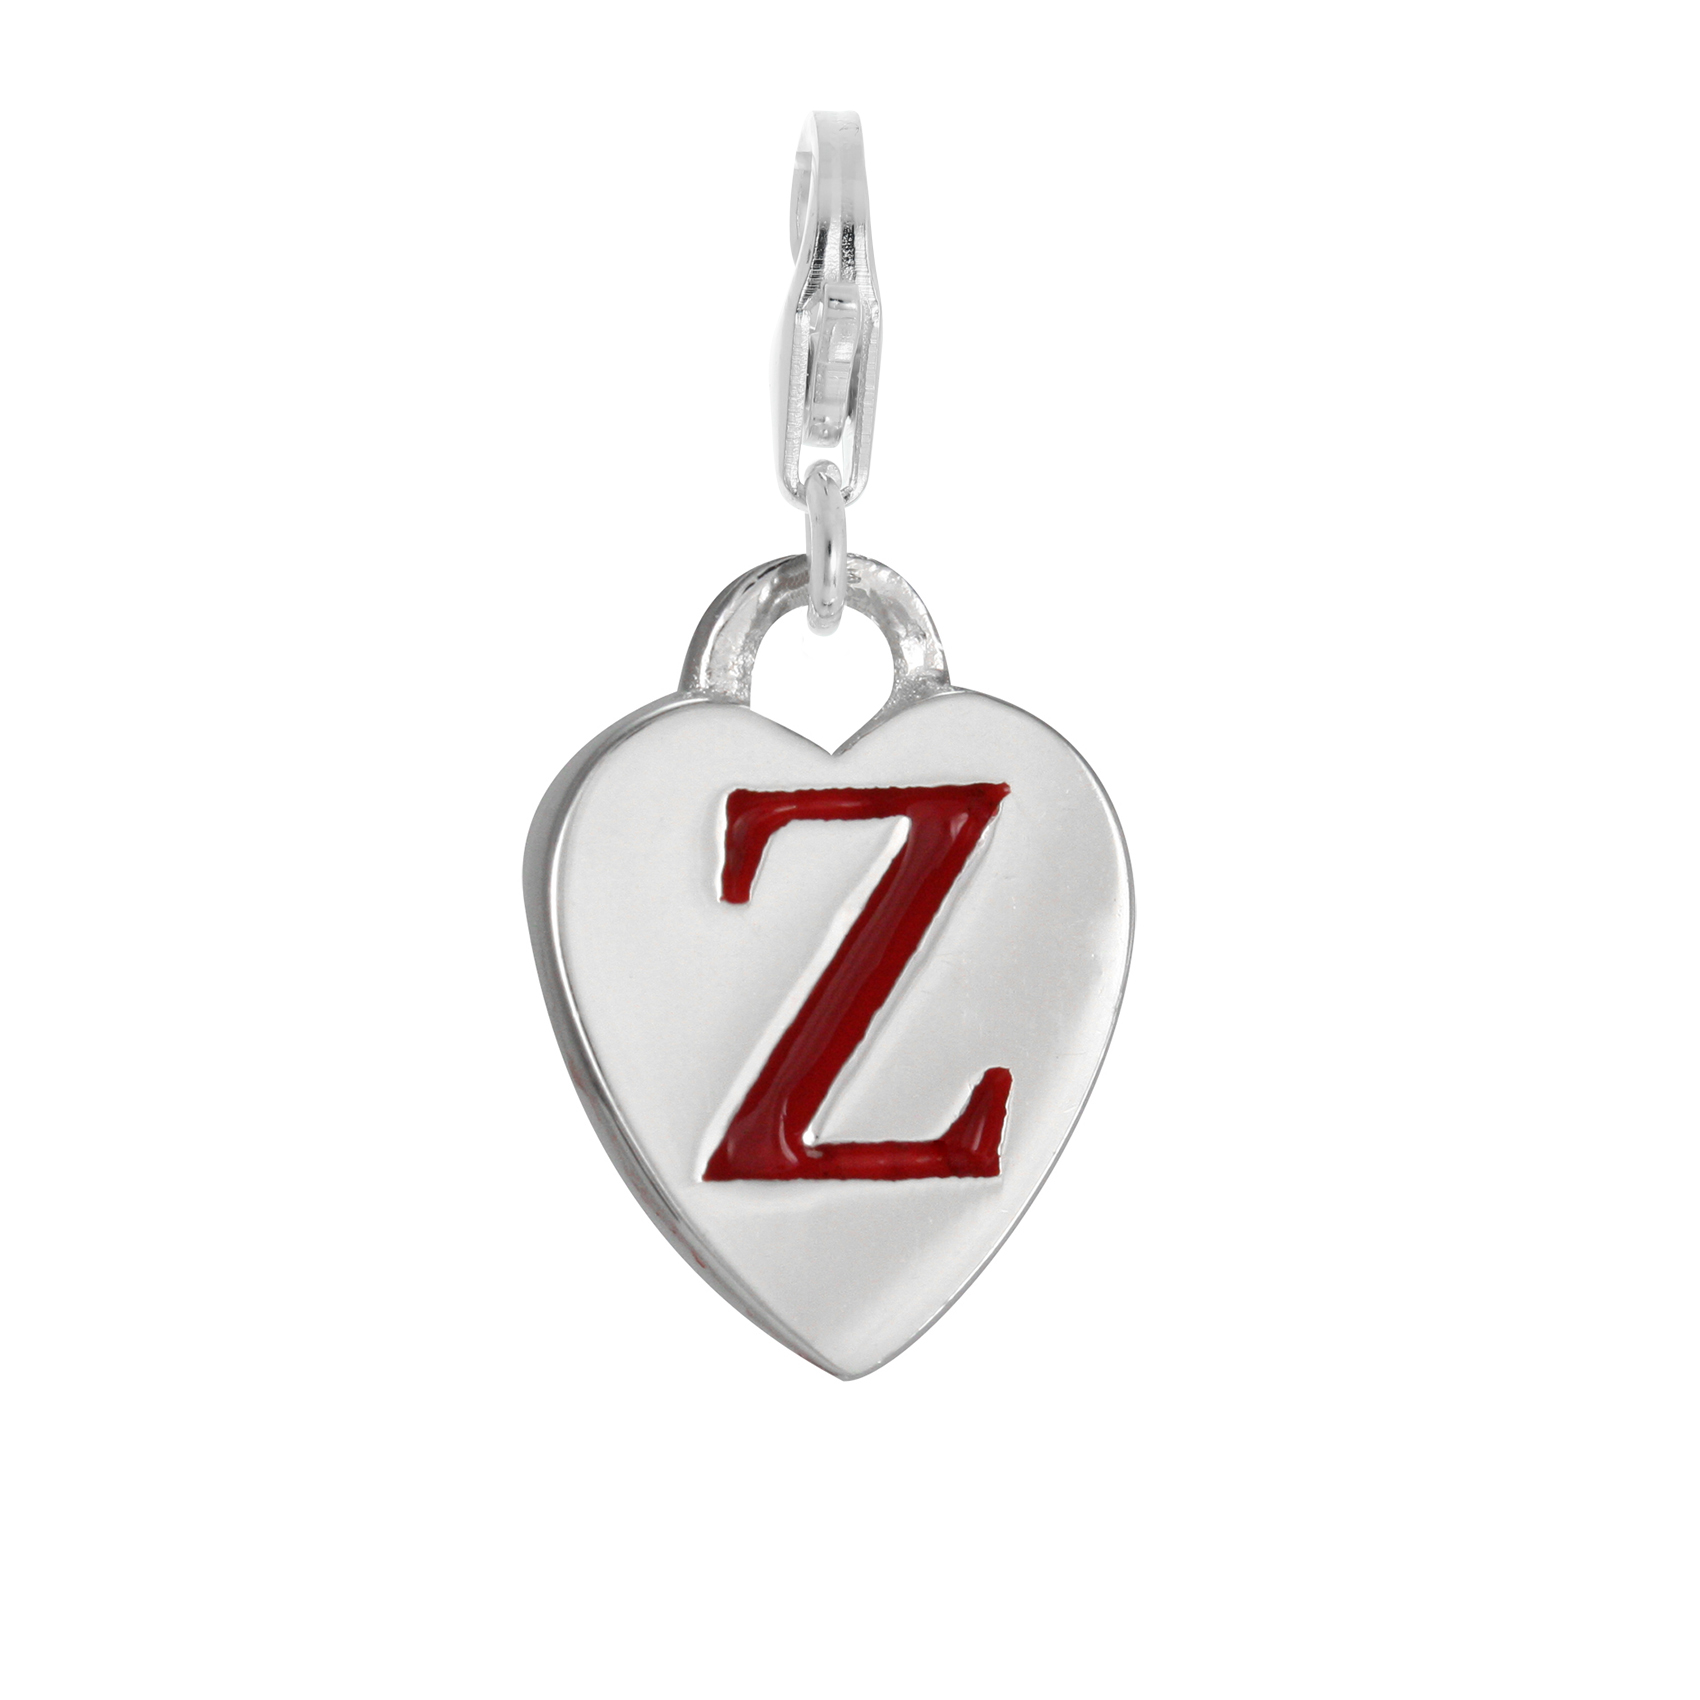 An image of Sterling Silver Enamel Heart Alphabet Letter Z Charm on Clip